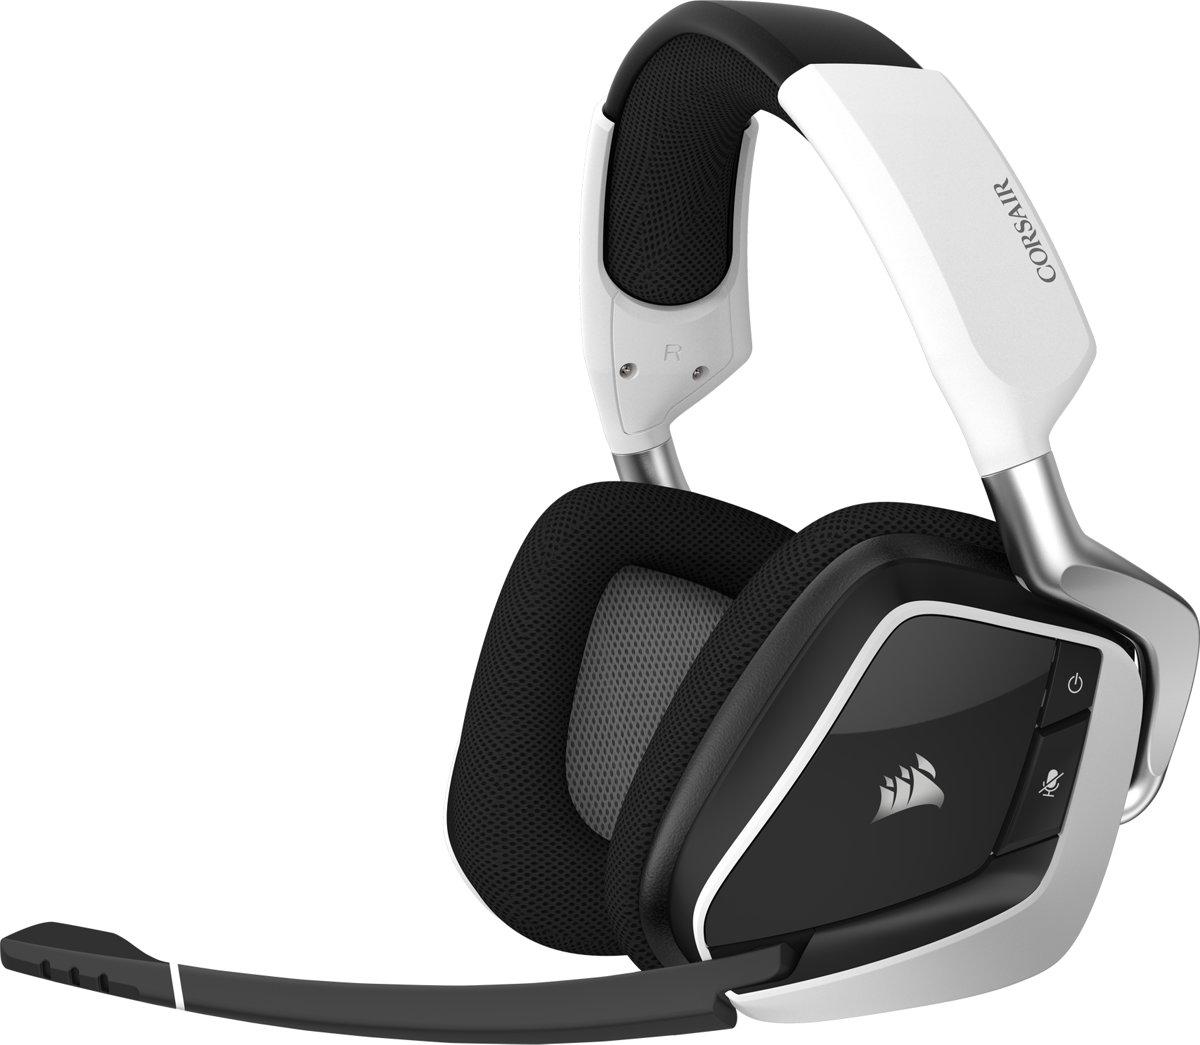 Corsair Void RGB Elite Surround Premium Draadloze Gaming Headset - Zwart/Wit - PC kopen